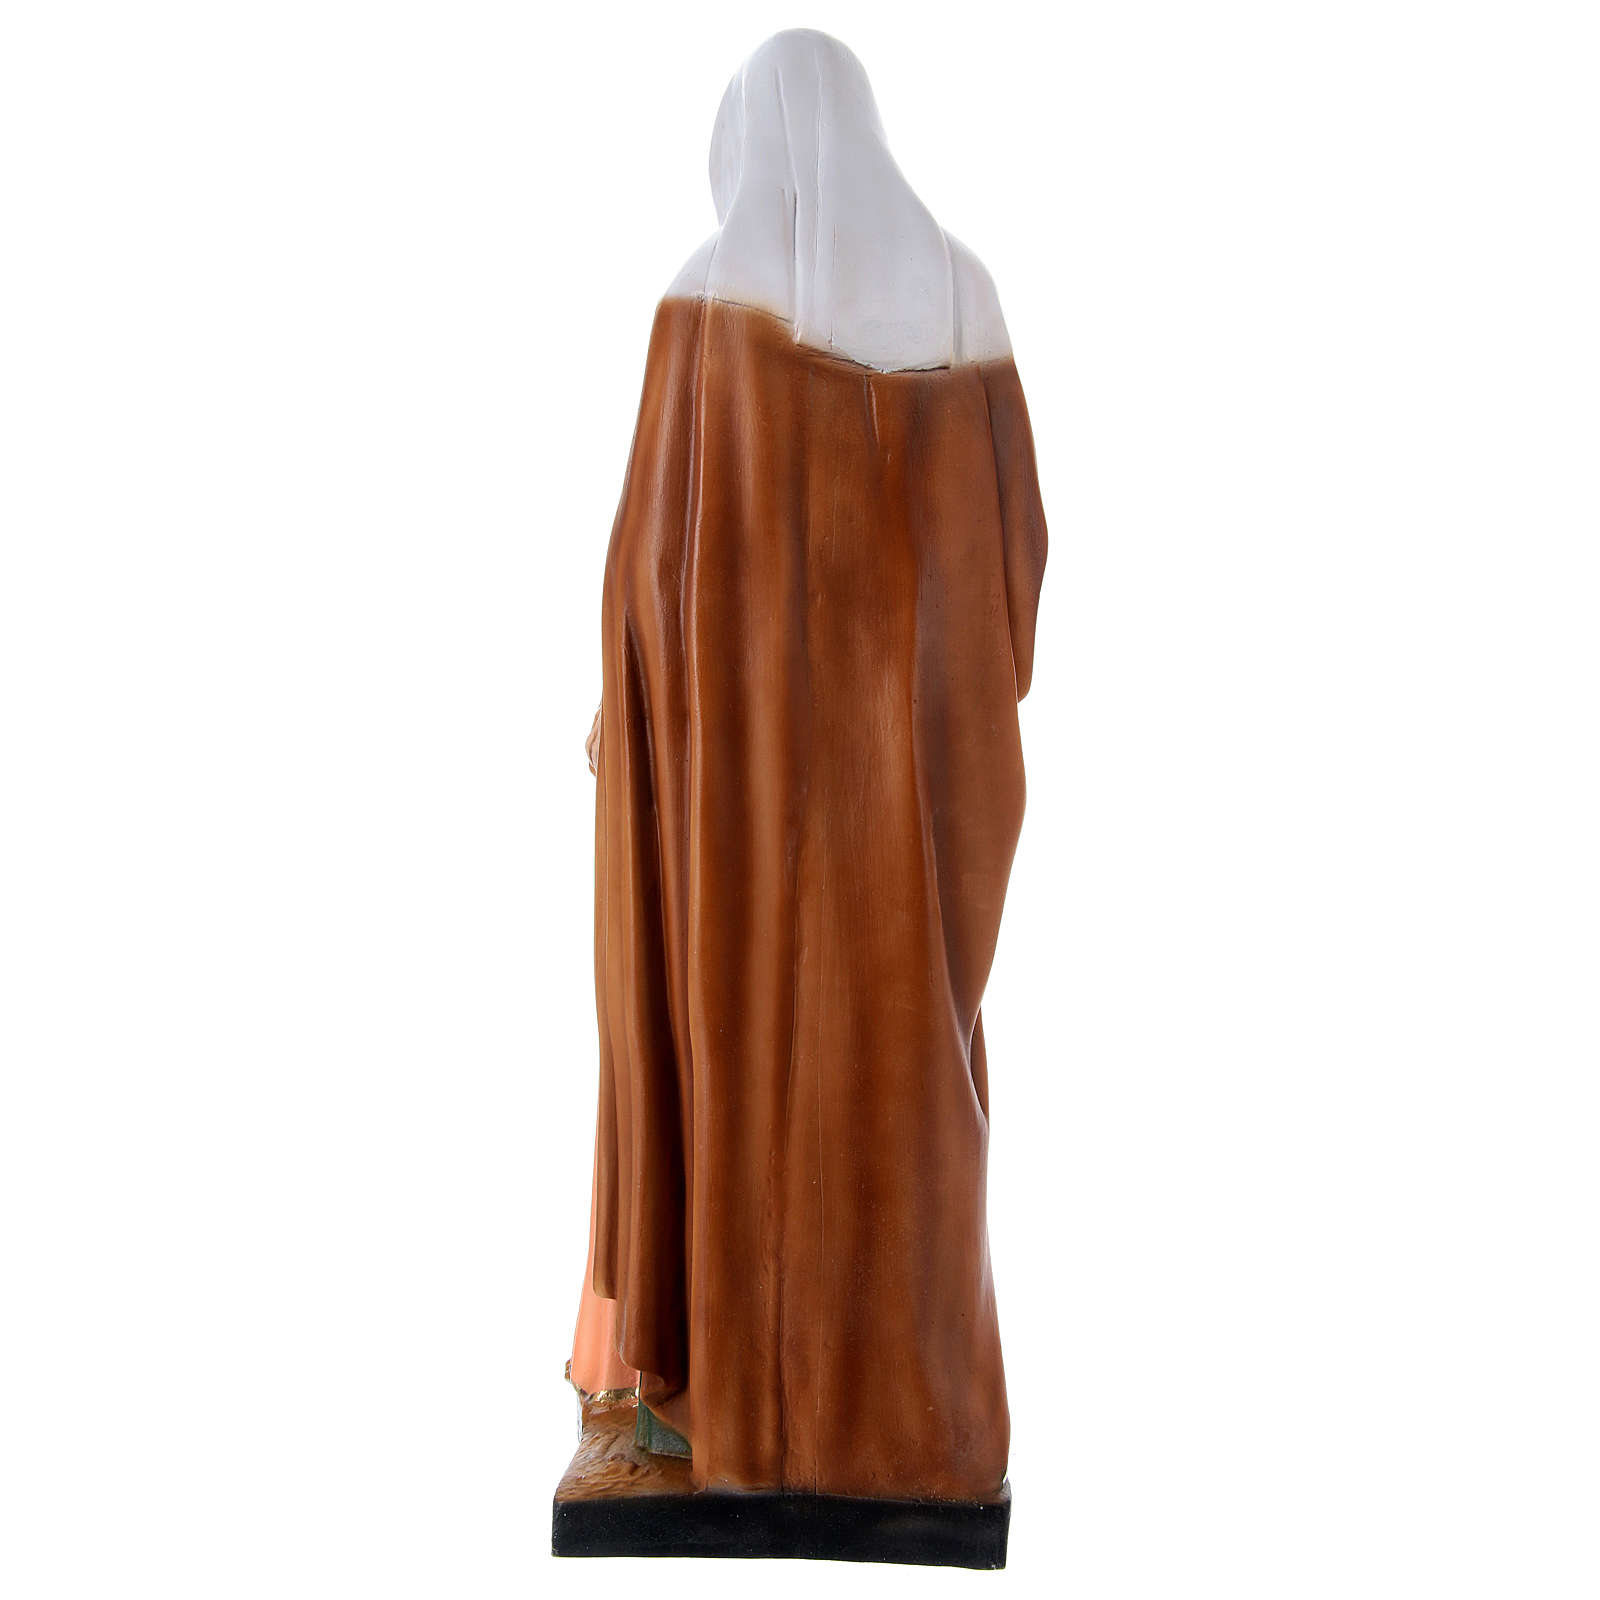 Estatua de resina Santa Ana h 60 cm 4